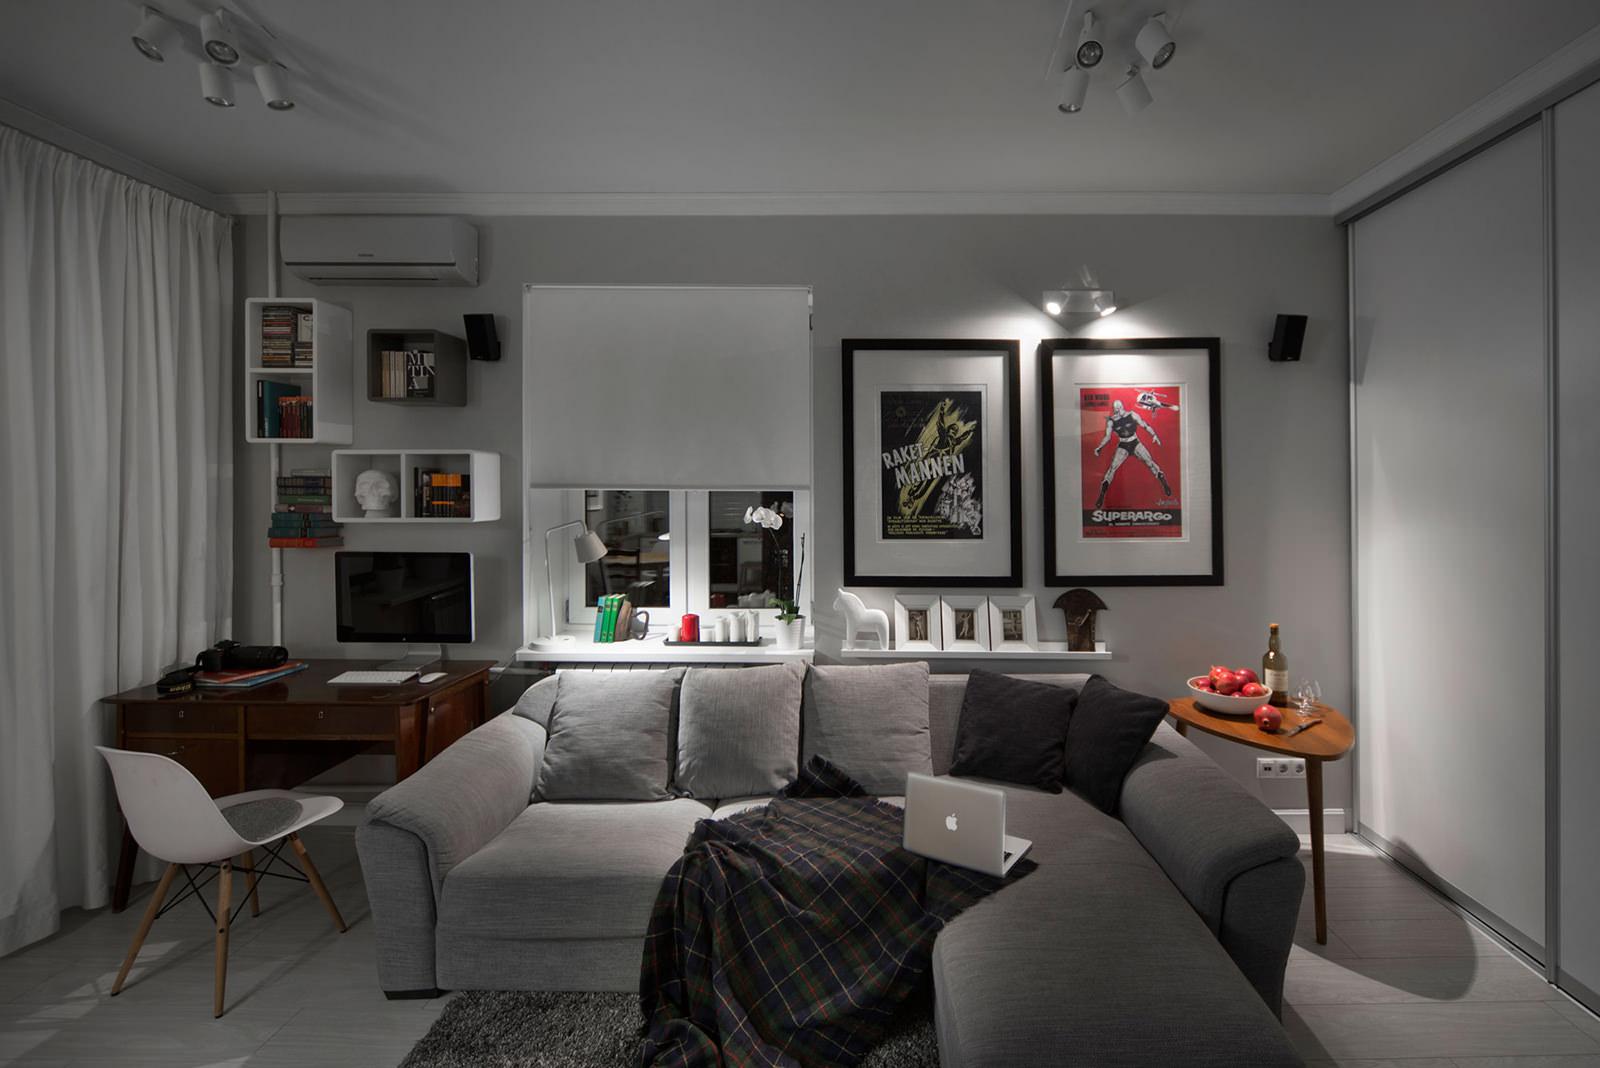 двухкомнатная квартира рабочая зона